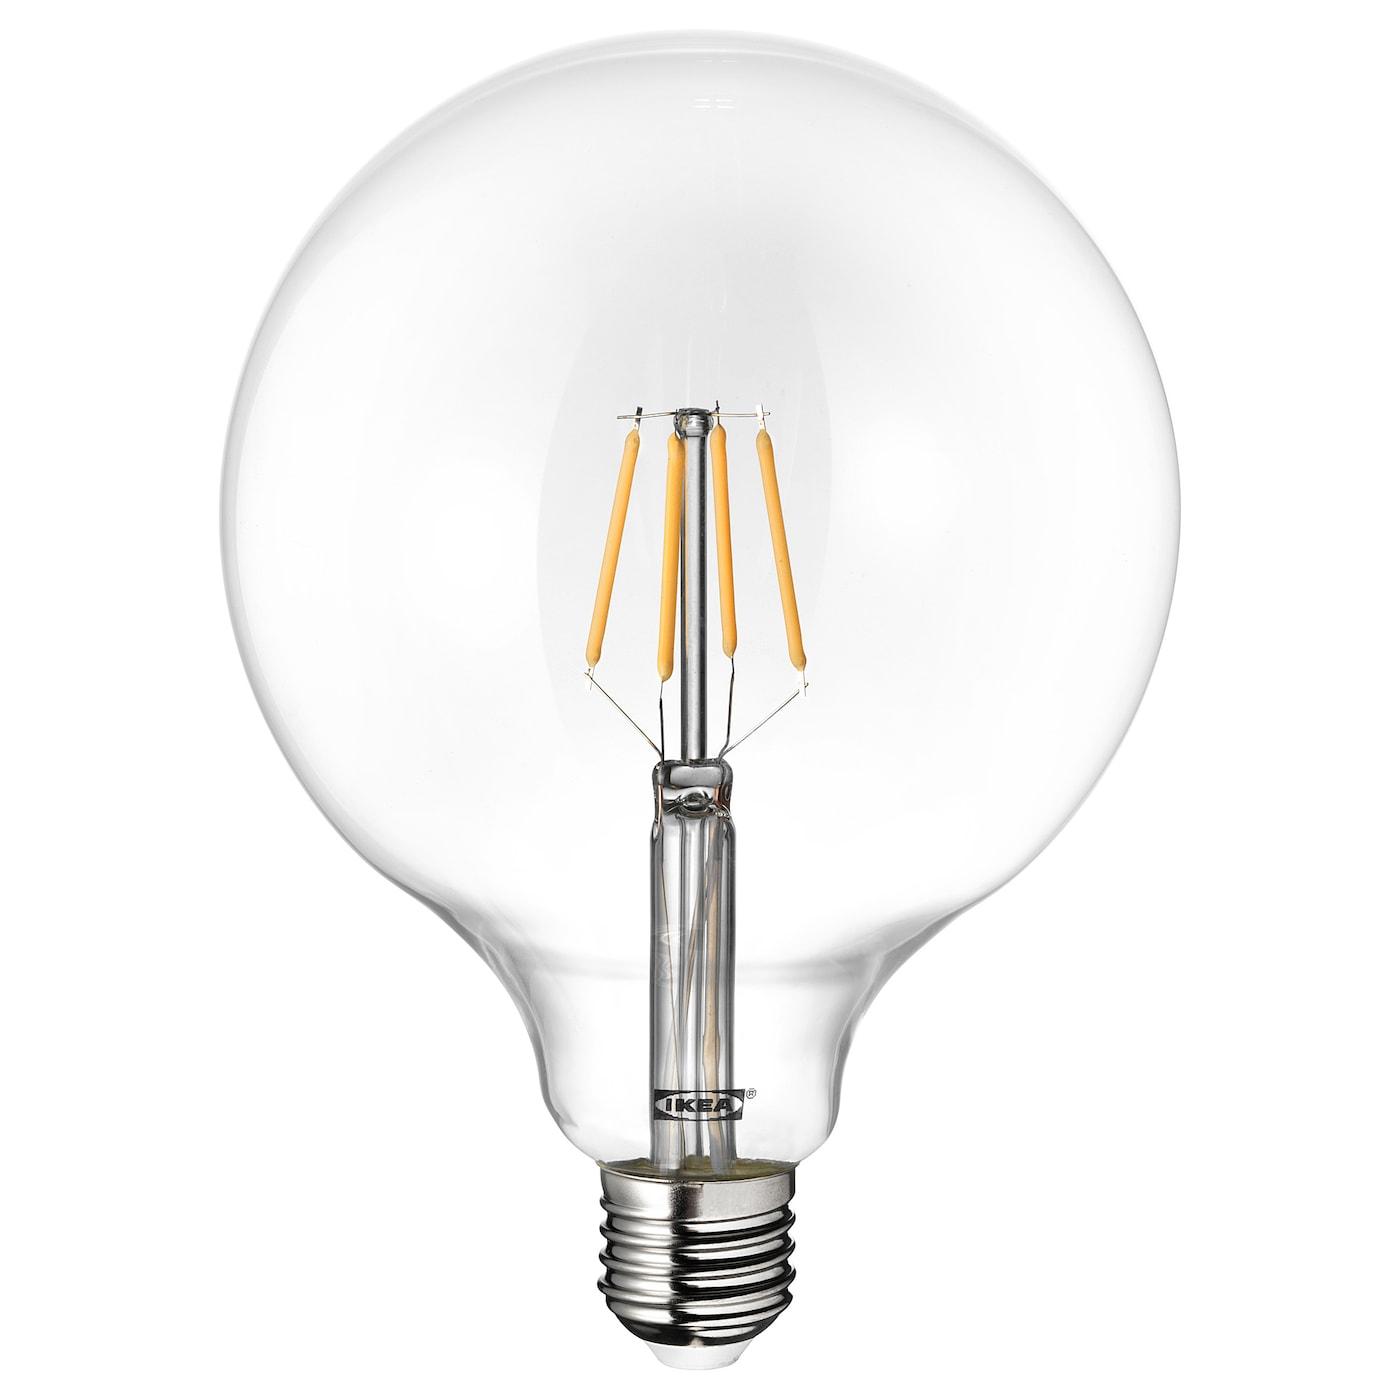 LUNNOM Ampoule LED E27 600 lumen Globe verre transparent